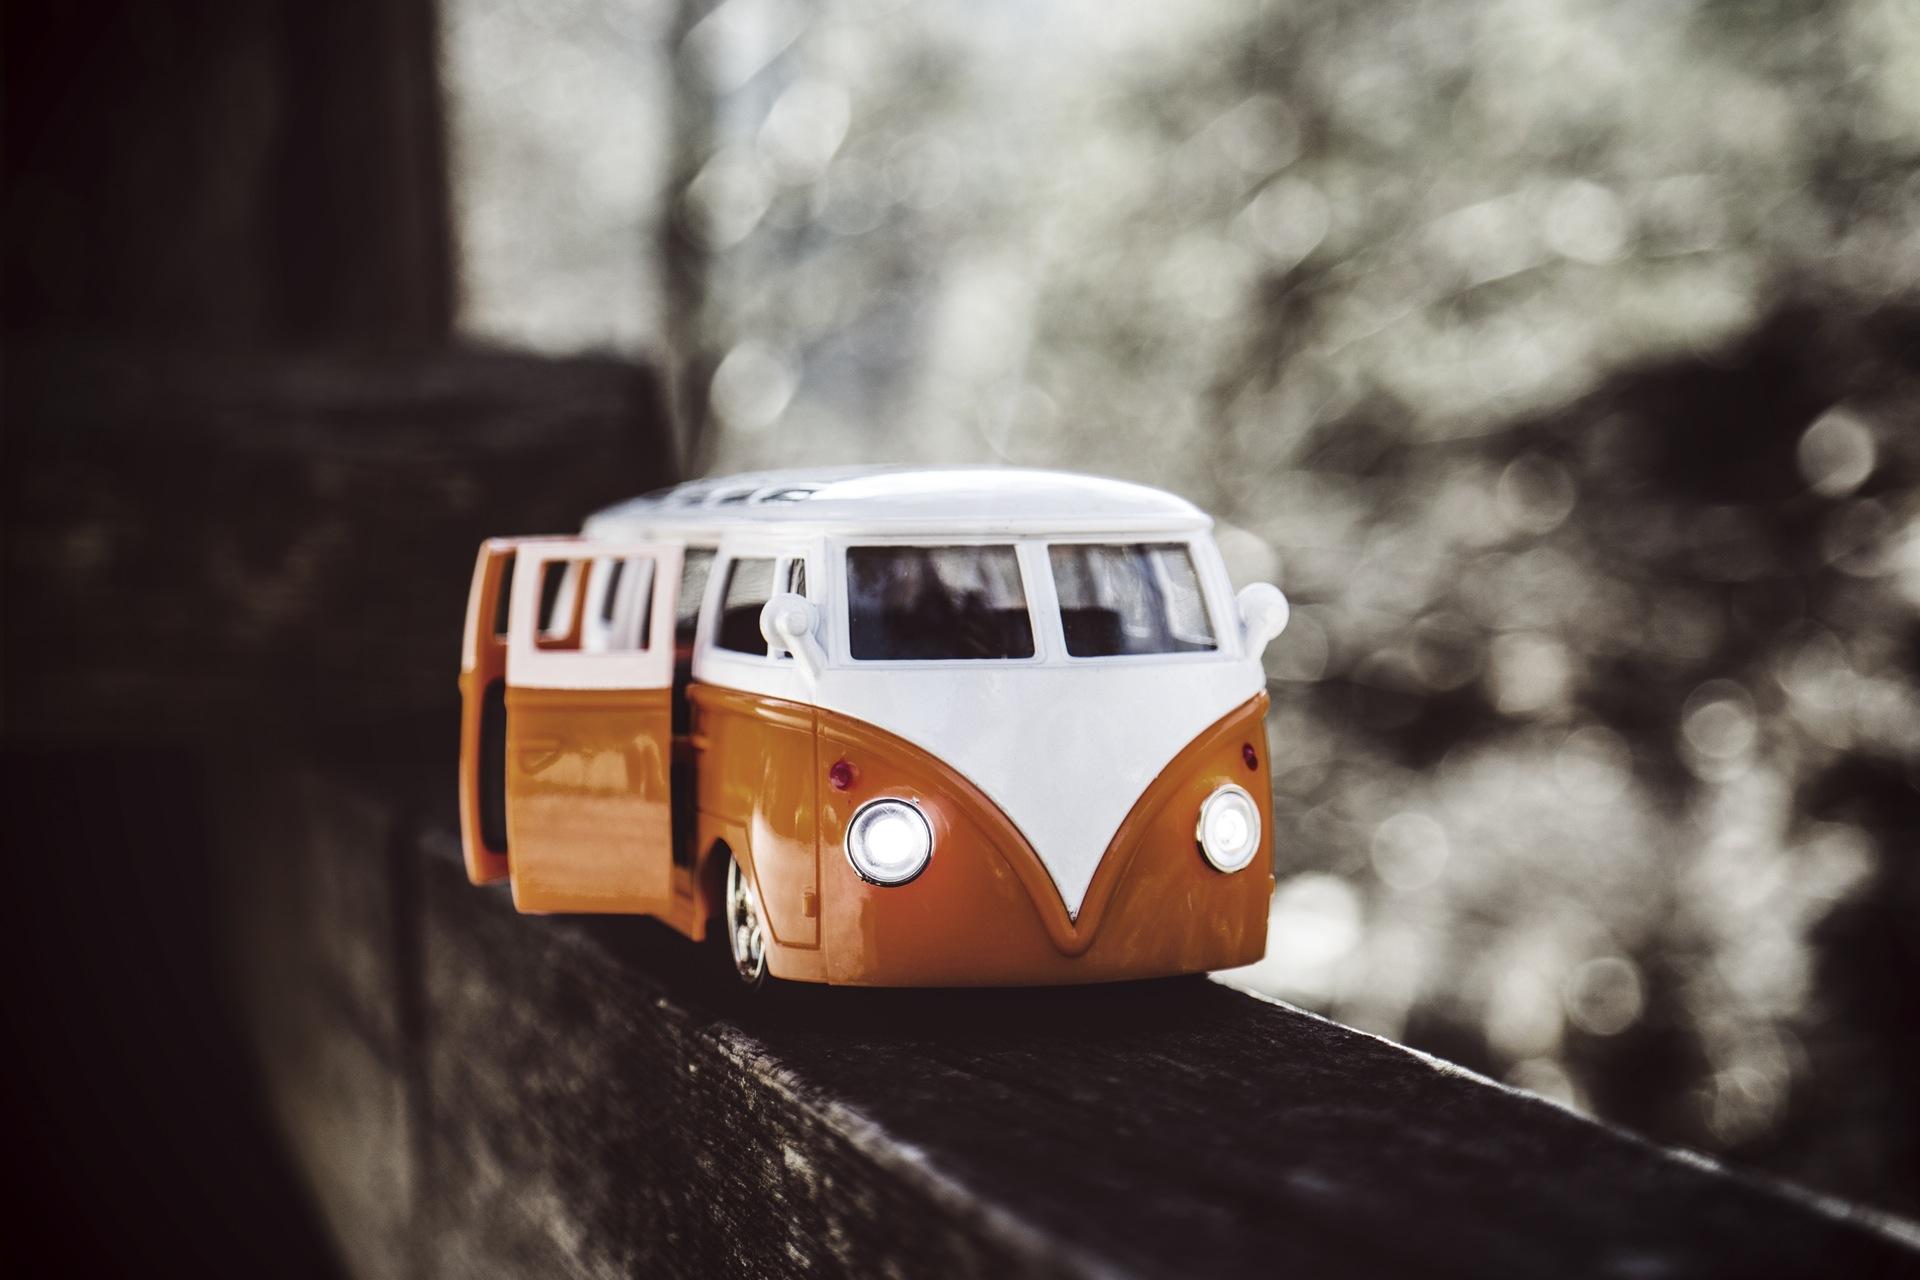 furgoneta, vehículo, juguete, hippie, amor, paz, volkswagen - Fondos de Pantalla HD - professor-falken.com